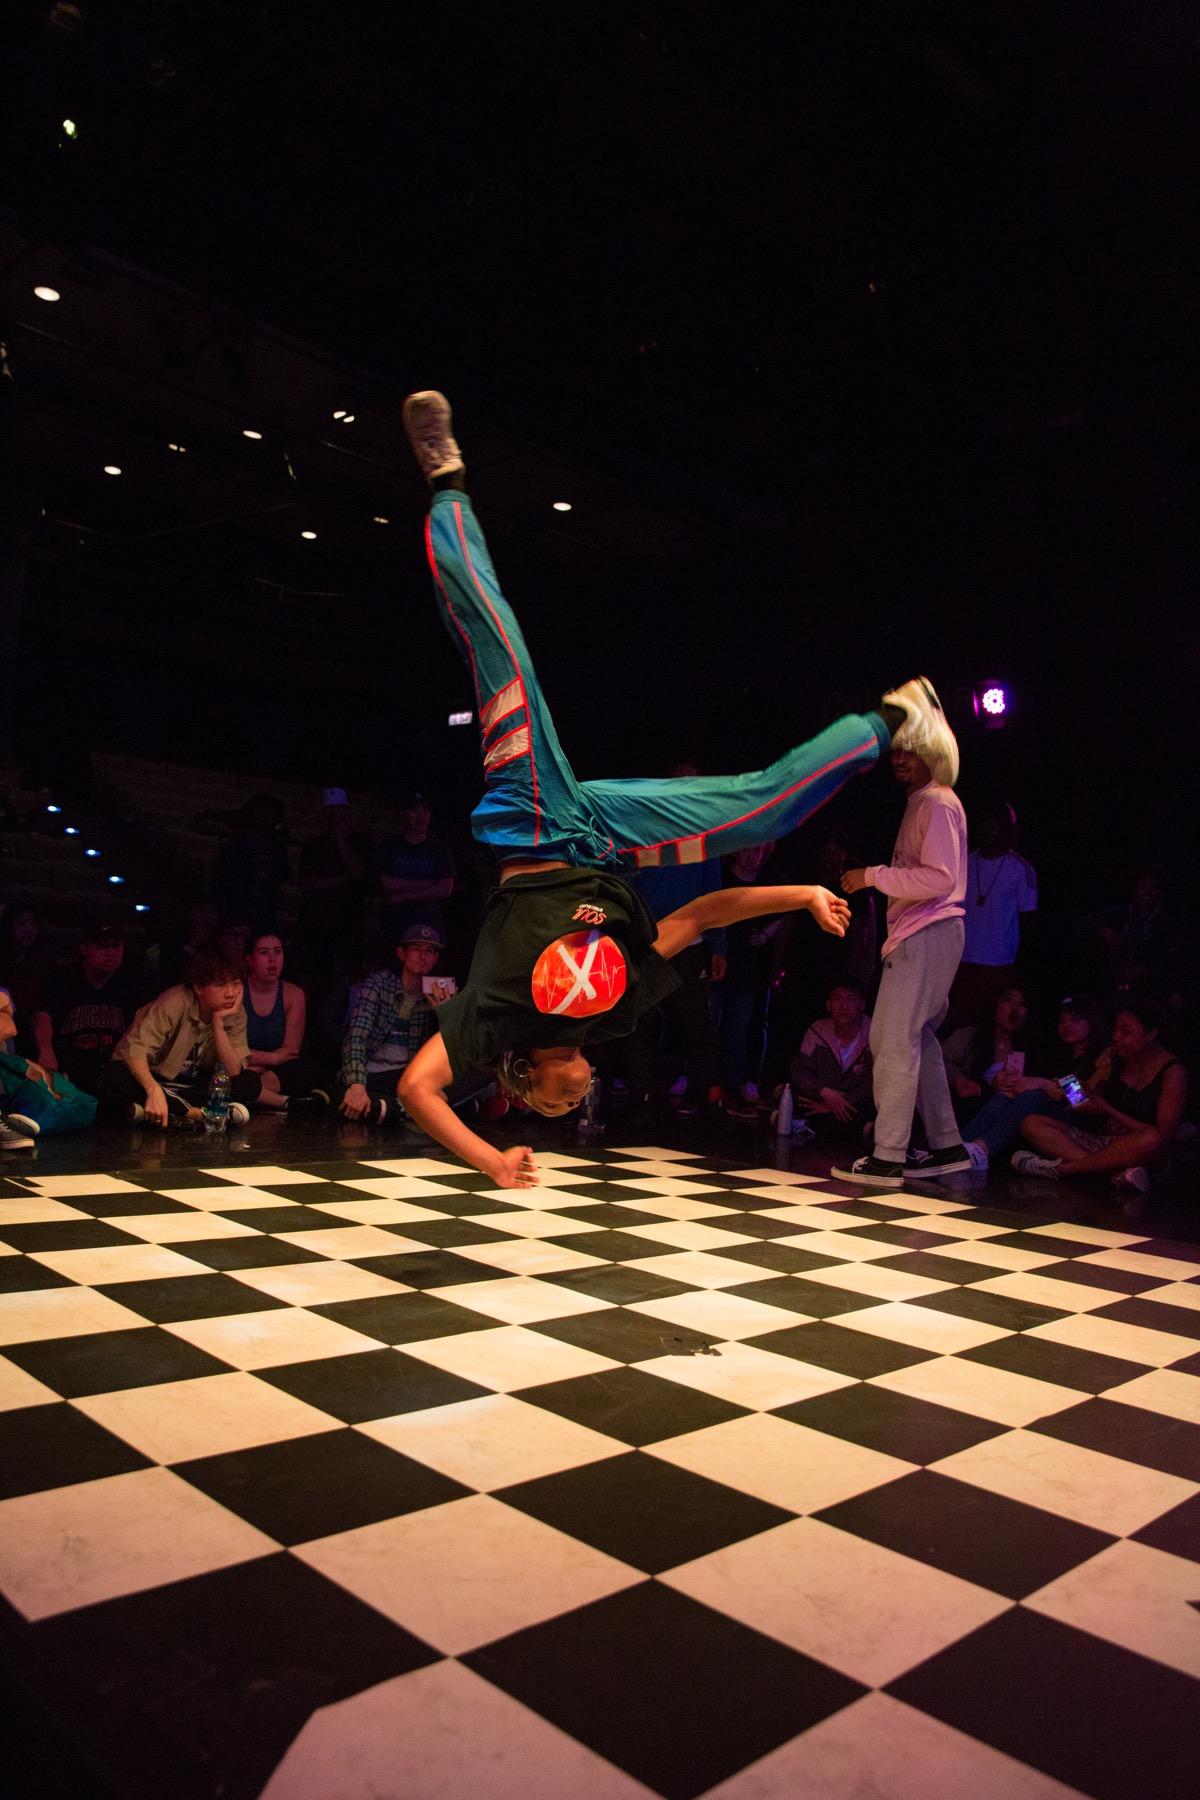 Man break dancing on a checkered floor